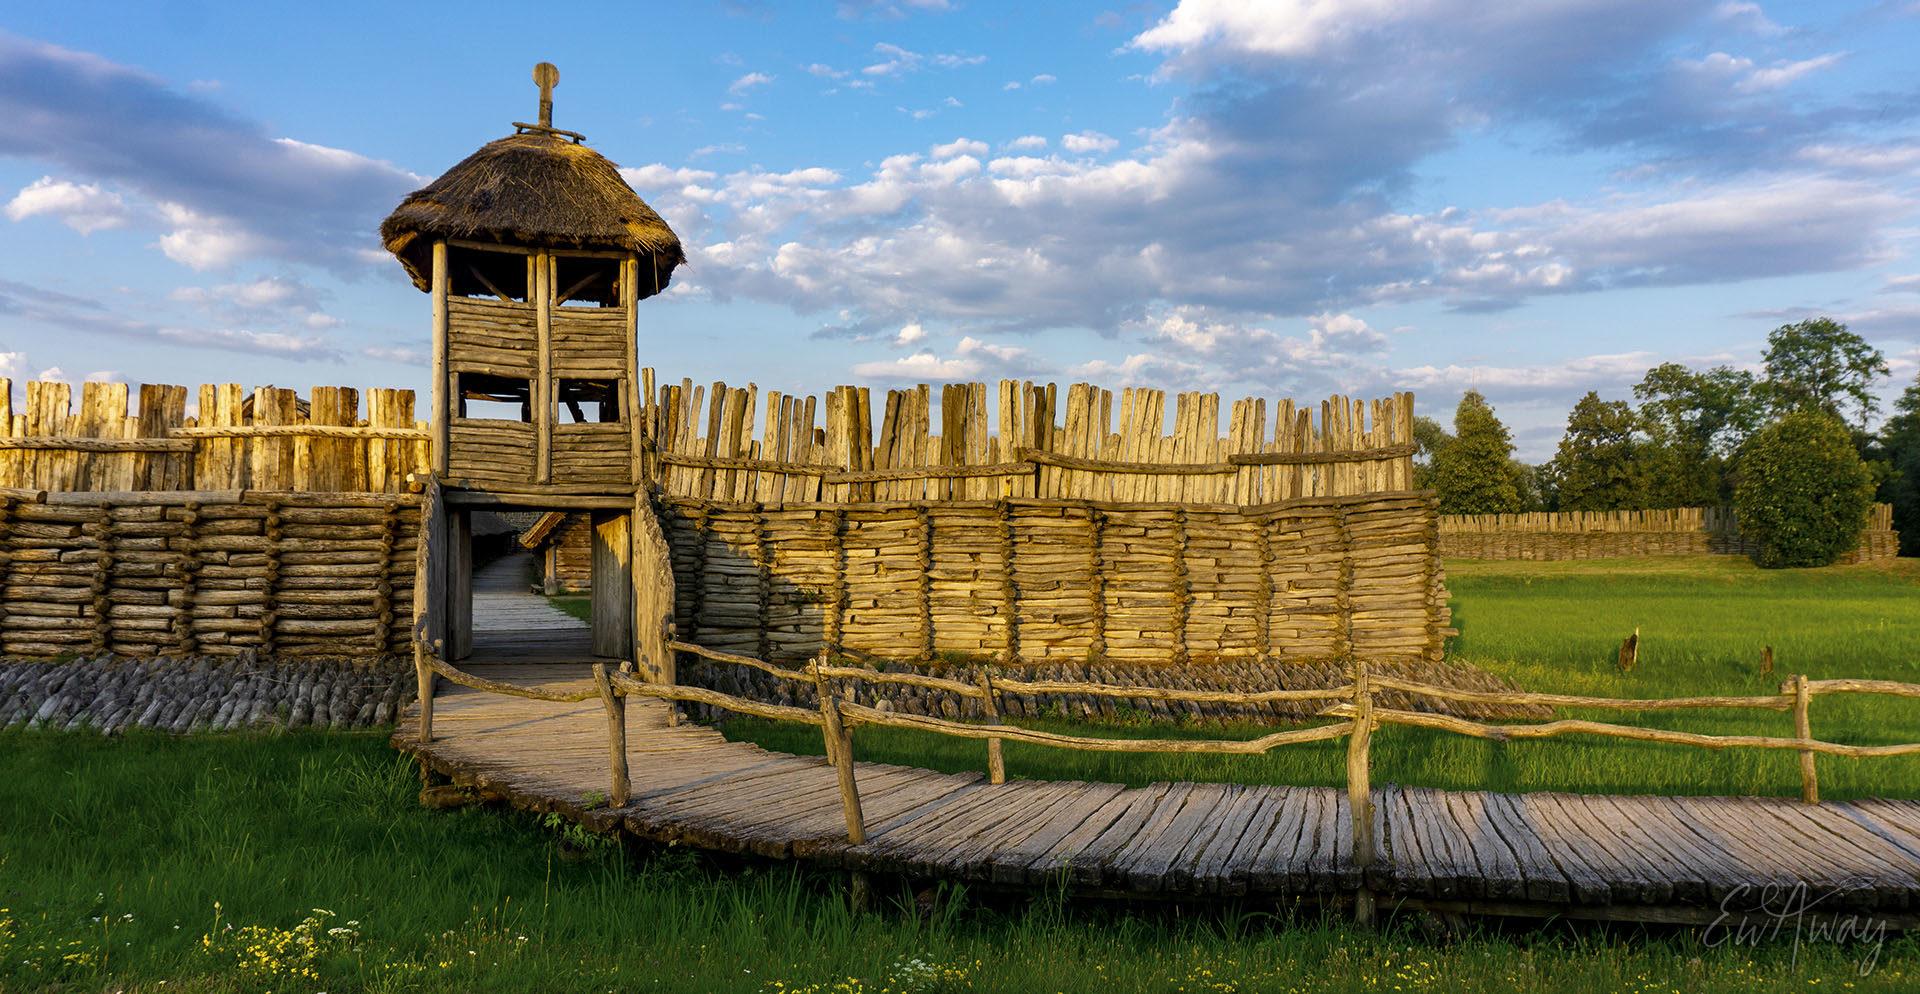 Biskupin Osada Łużycka - brama | EWAway